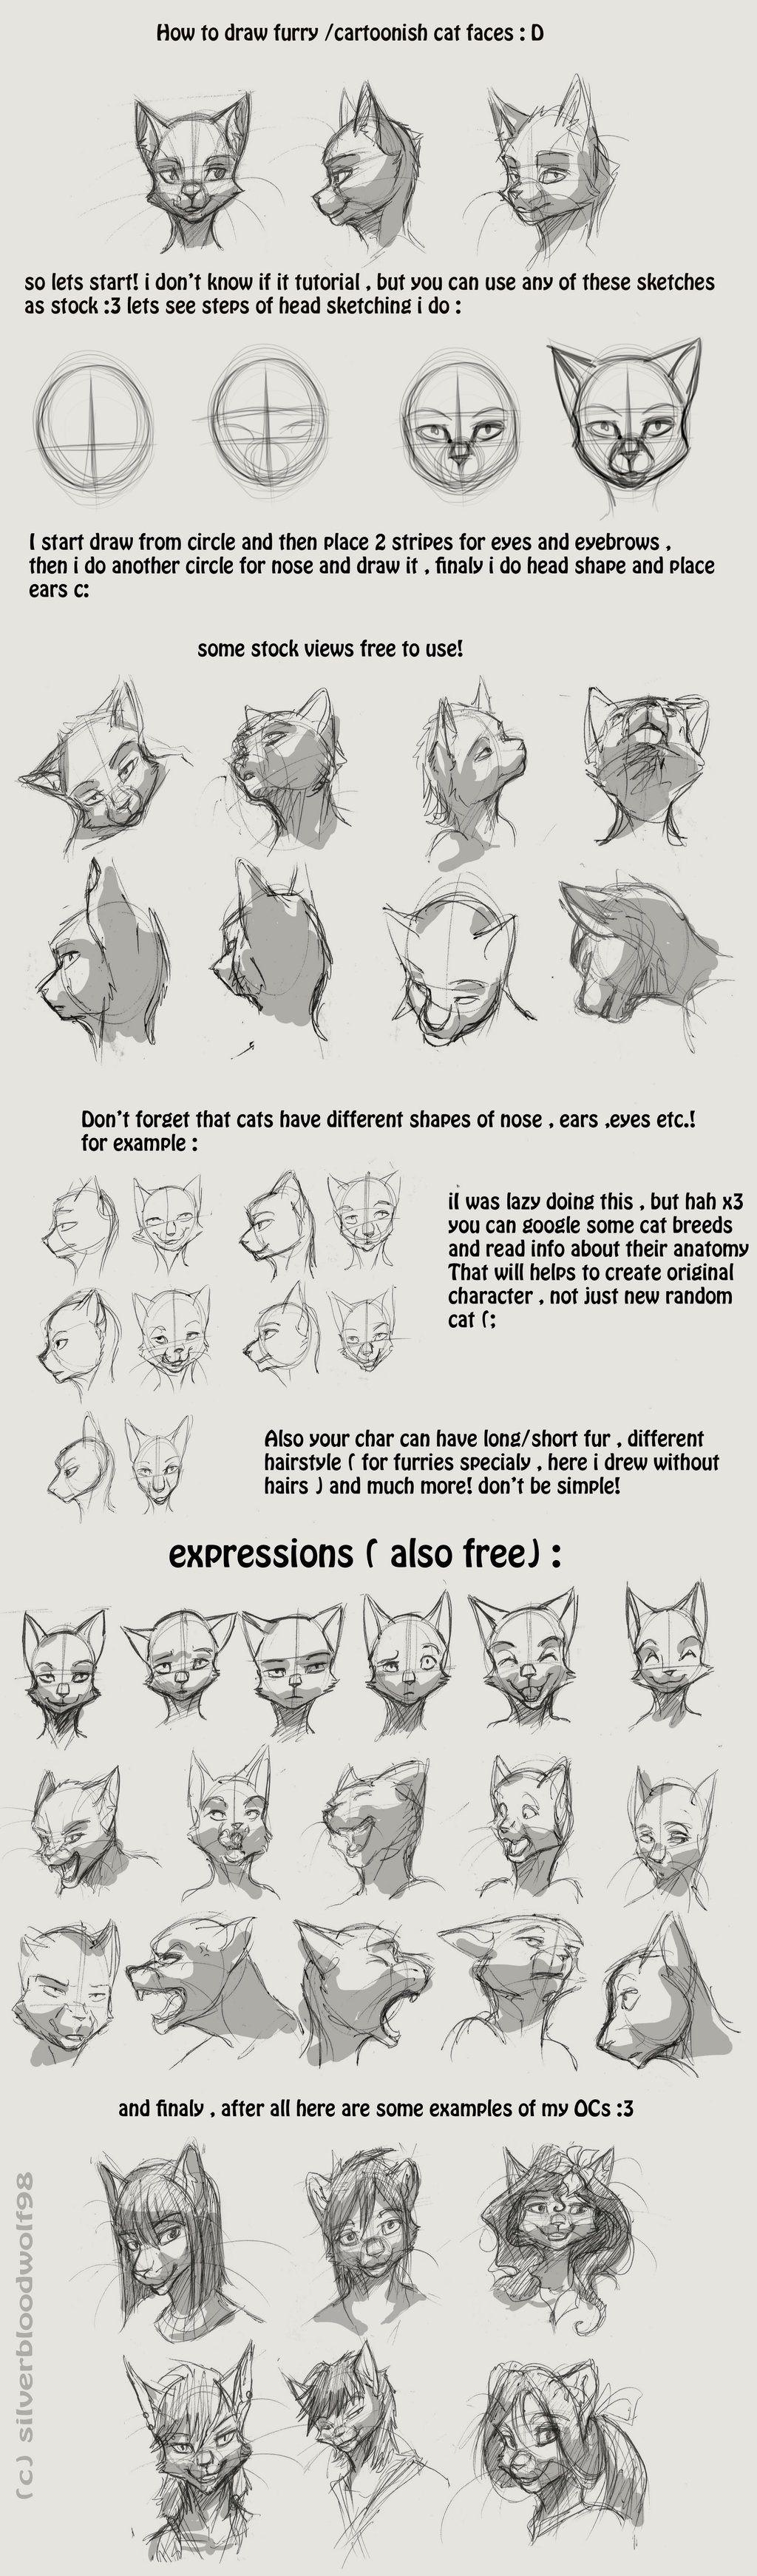 Furry Cartoon Cat Head Tutorial By Silverbloodwolf98